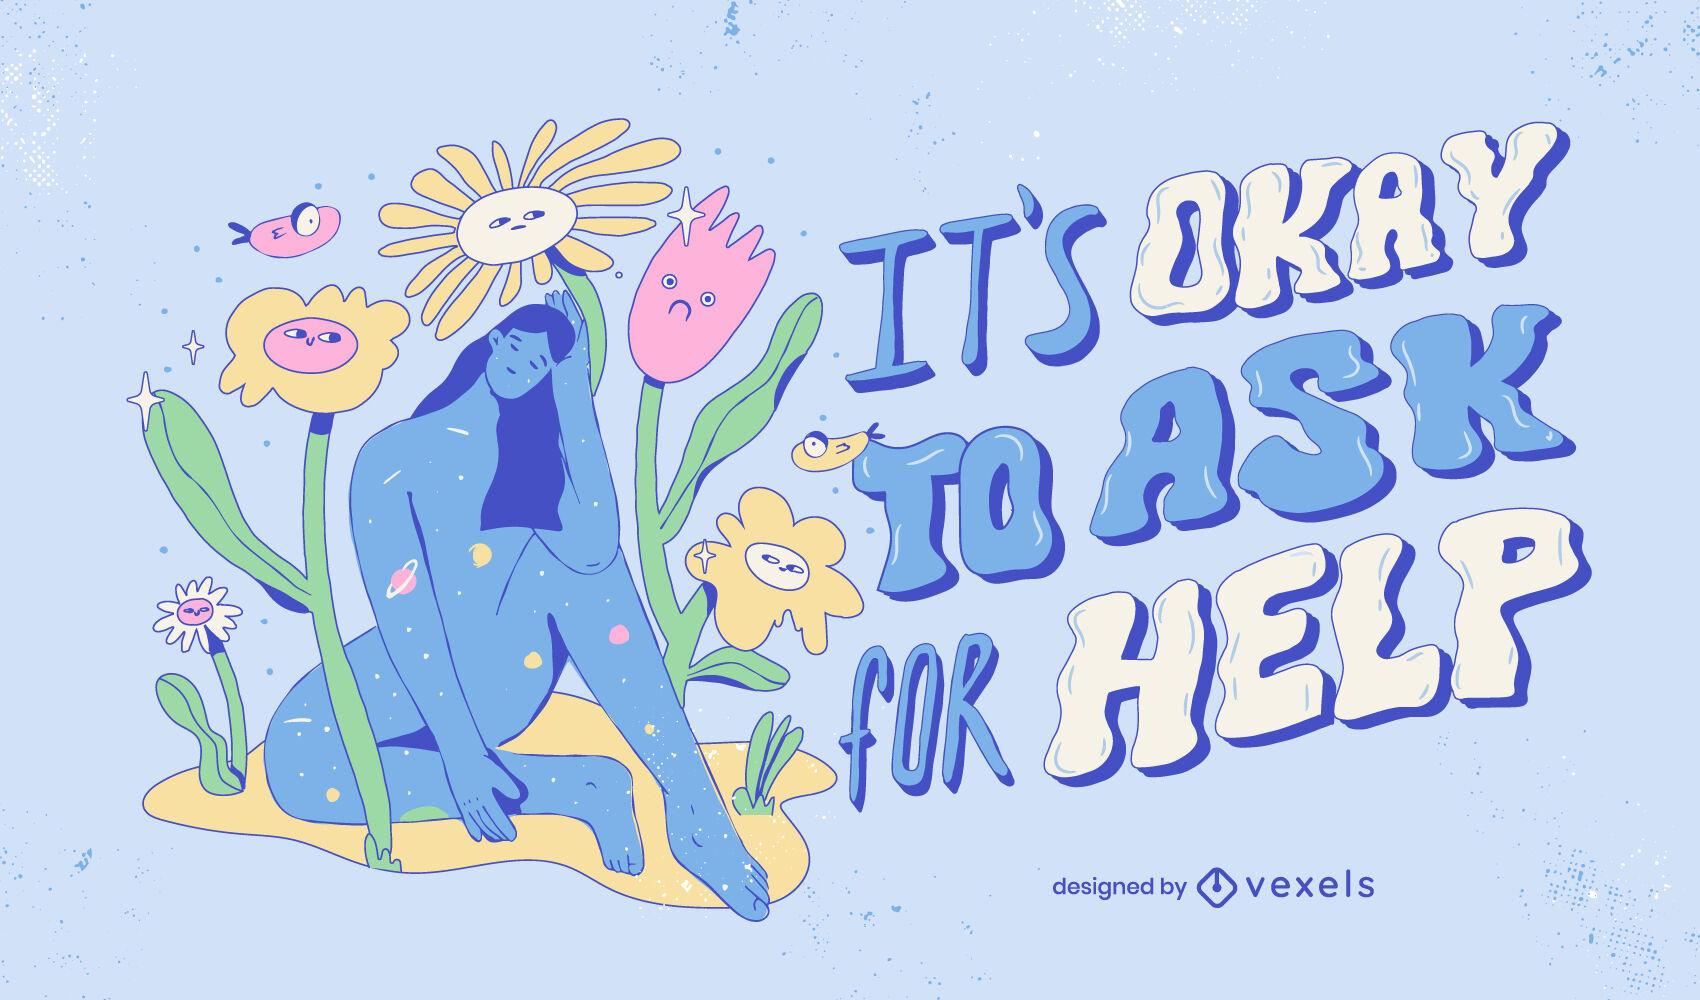 Motivational neurodiversity illustration design